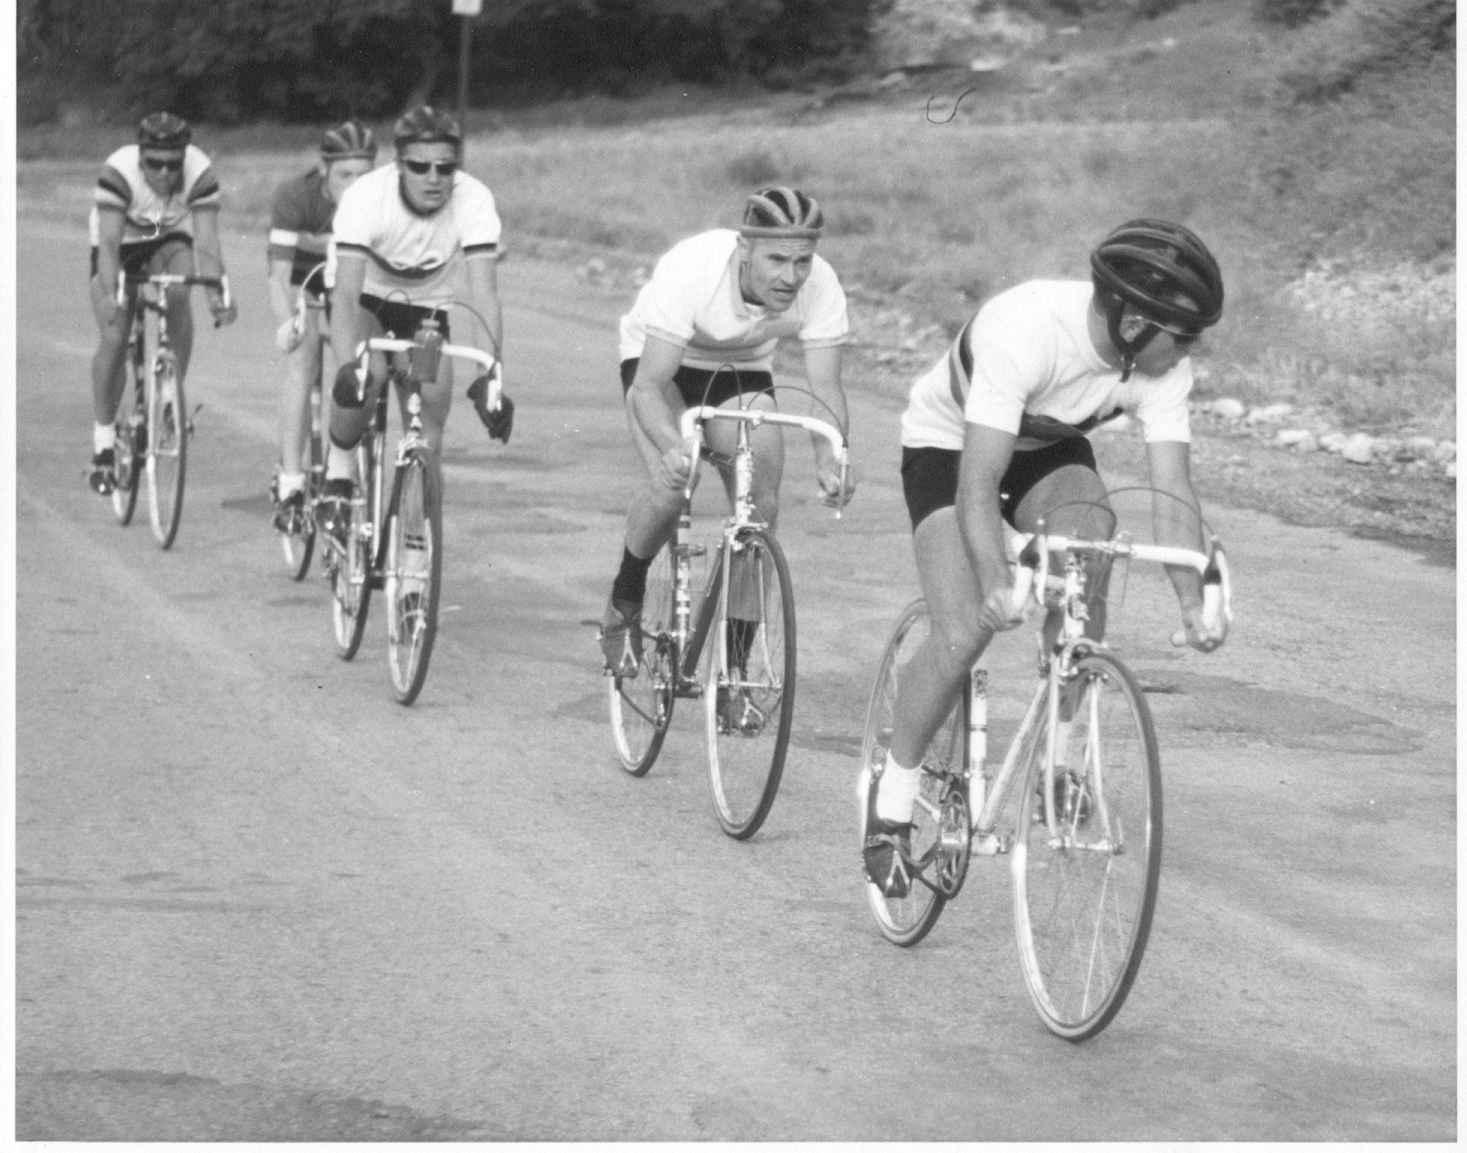 Pete Locke, Bill Young, Rodney Golsan, Unknown, Jan Hyde - Memorial Day race circa 1964. Photo courtesy Jan